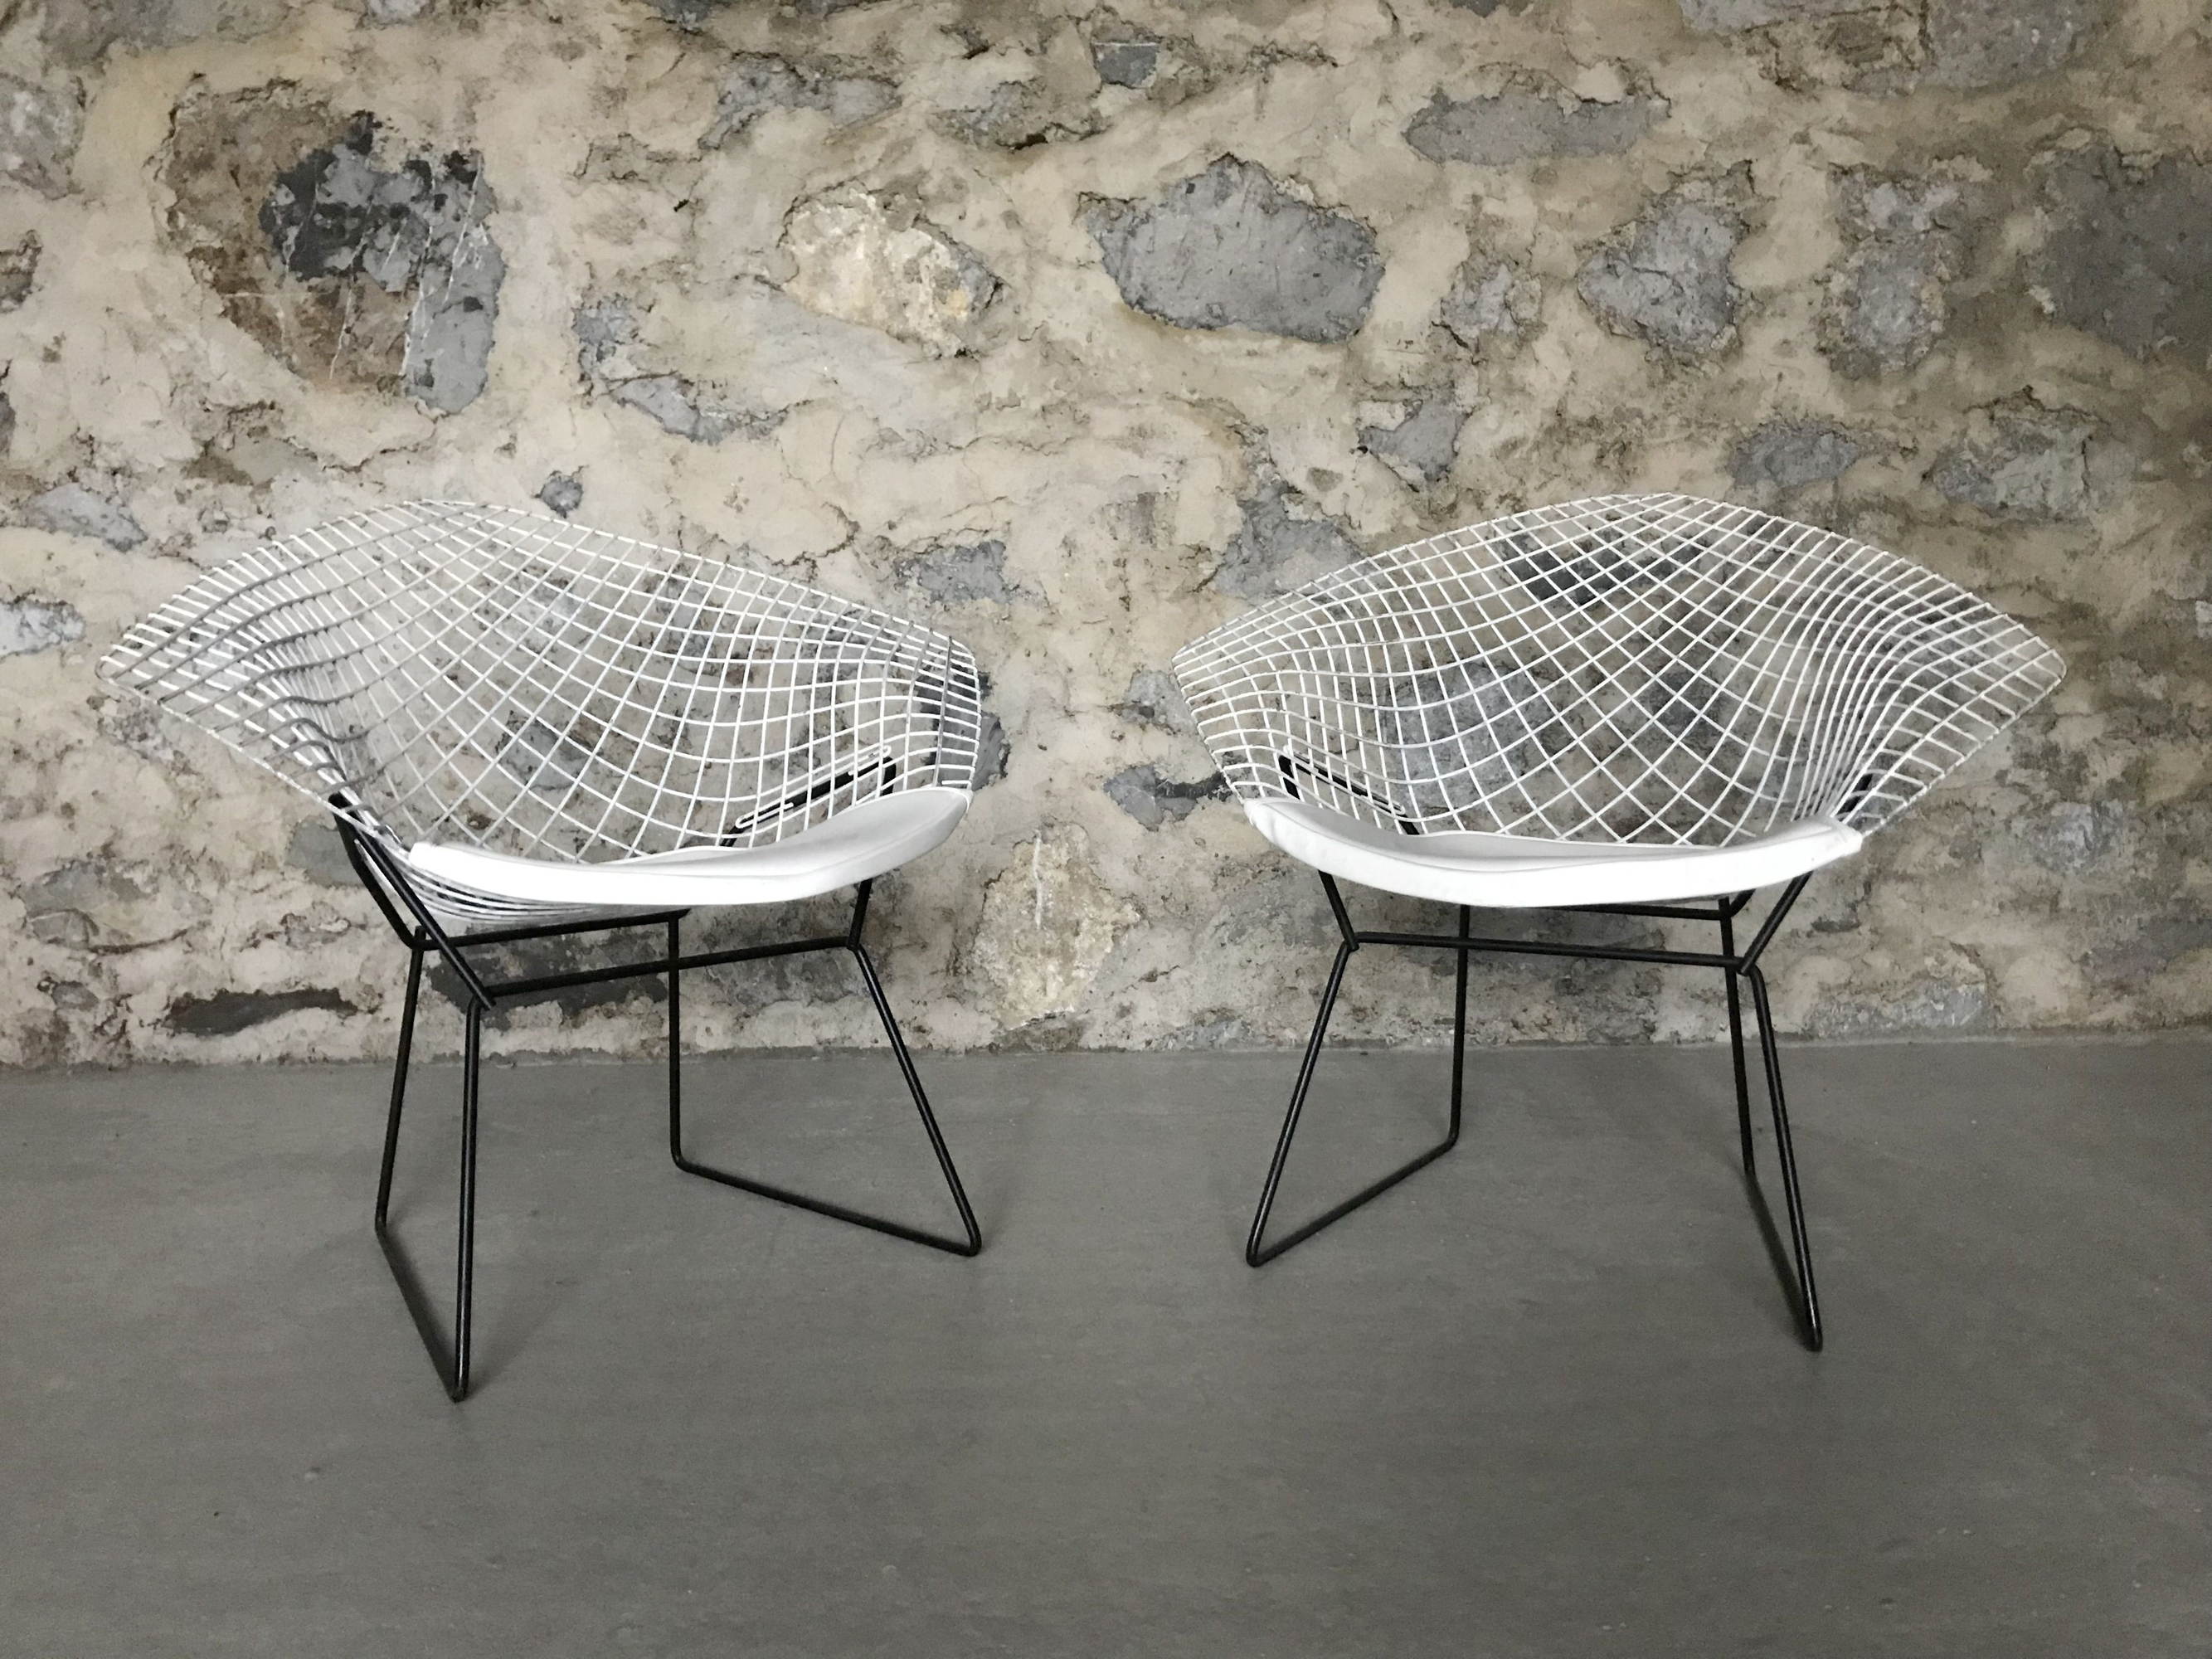 2. fauteuils-diamond-harry-bertoia-pour-knoll.jpg